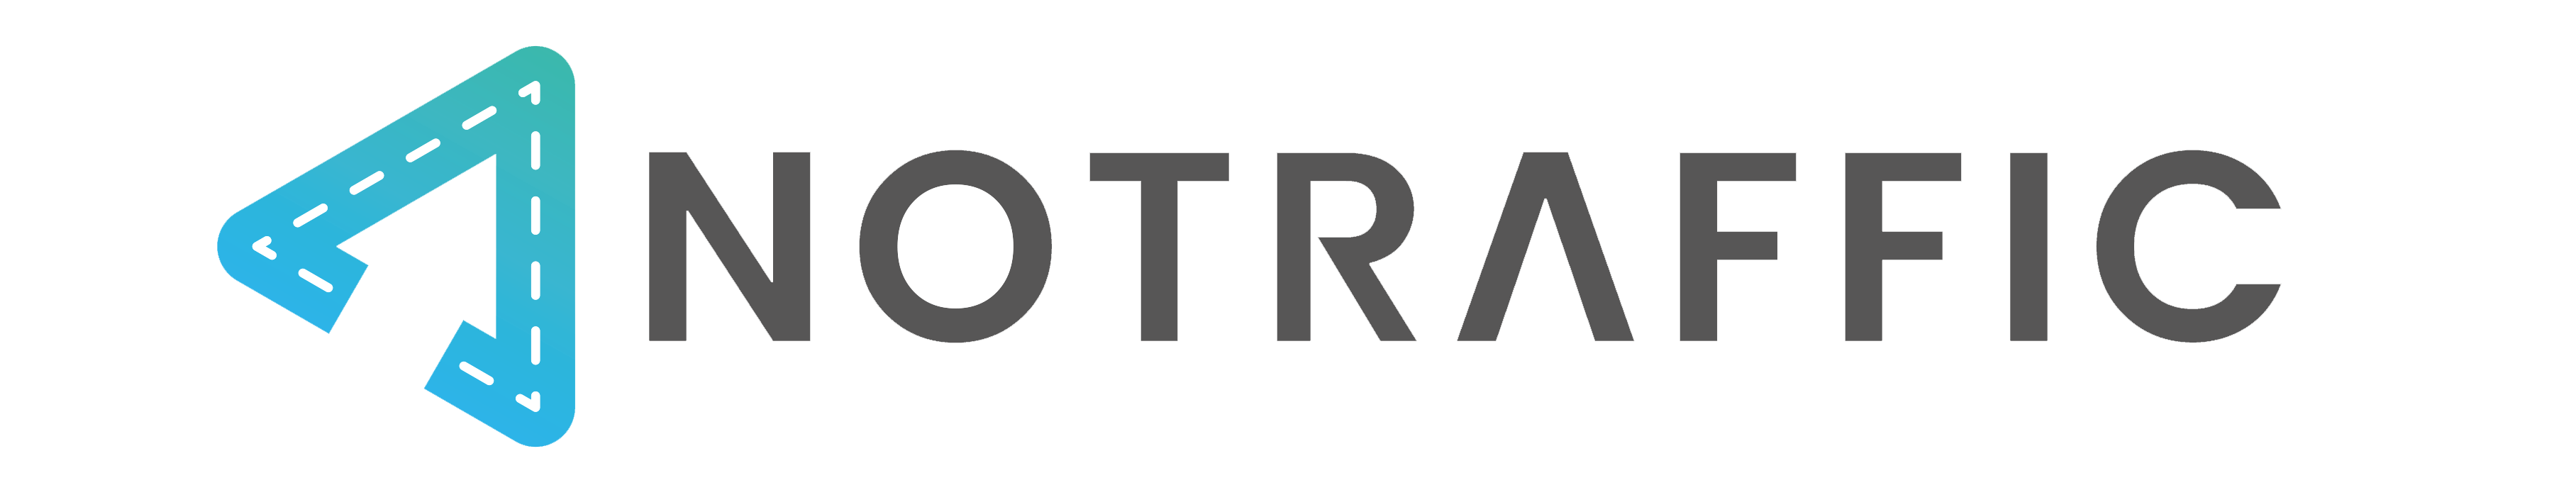 NoTraffic - Bringing Traffic Lights to the 21st Century